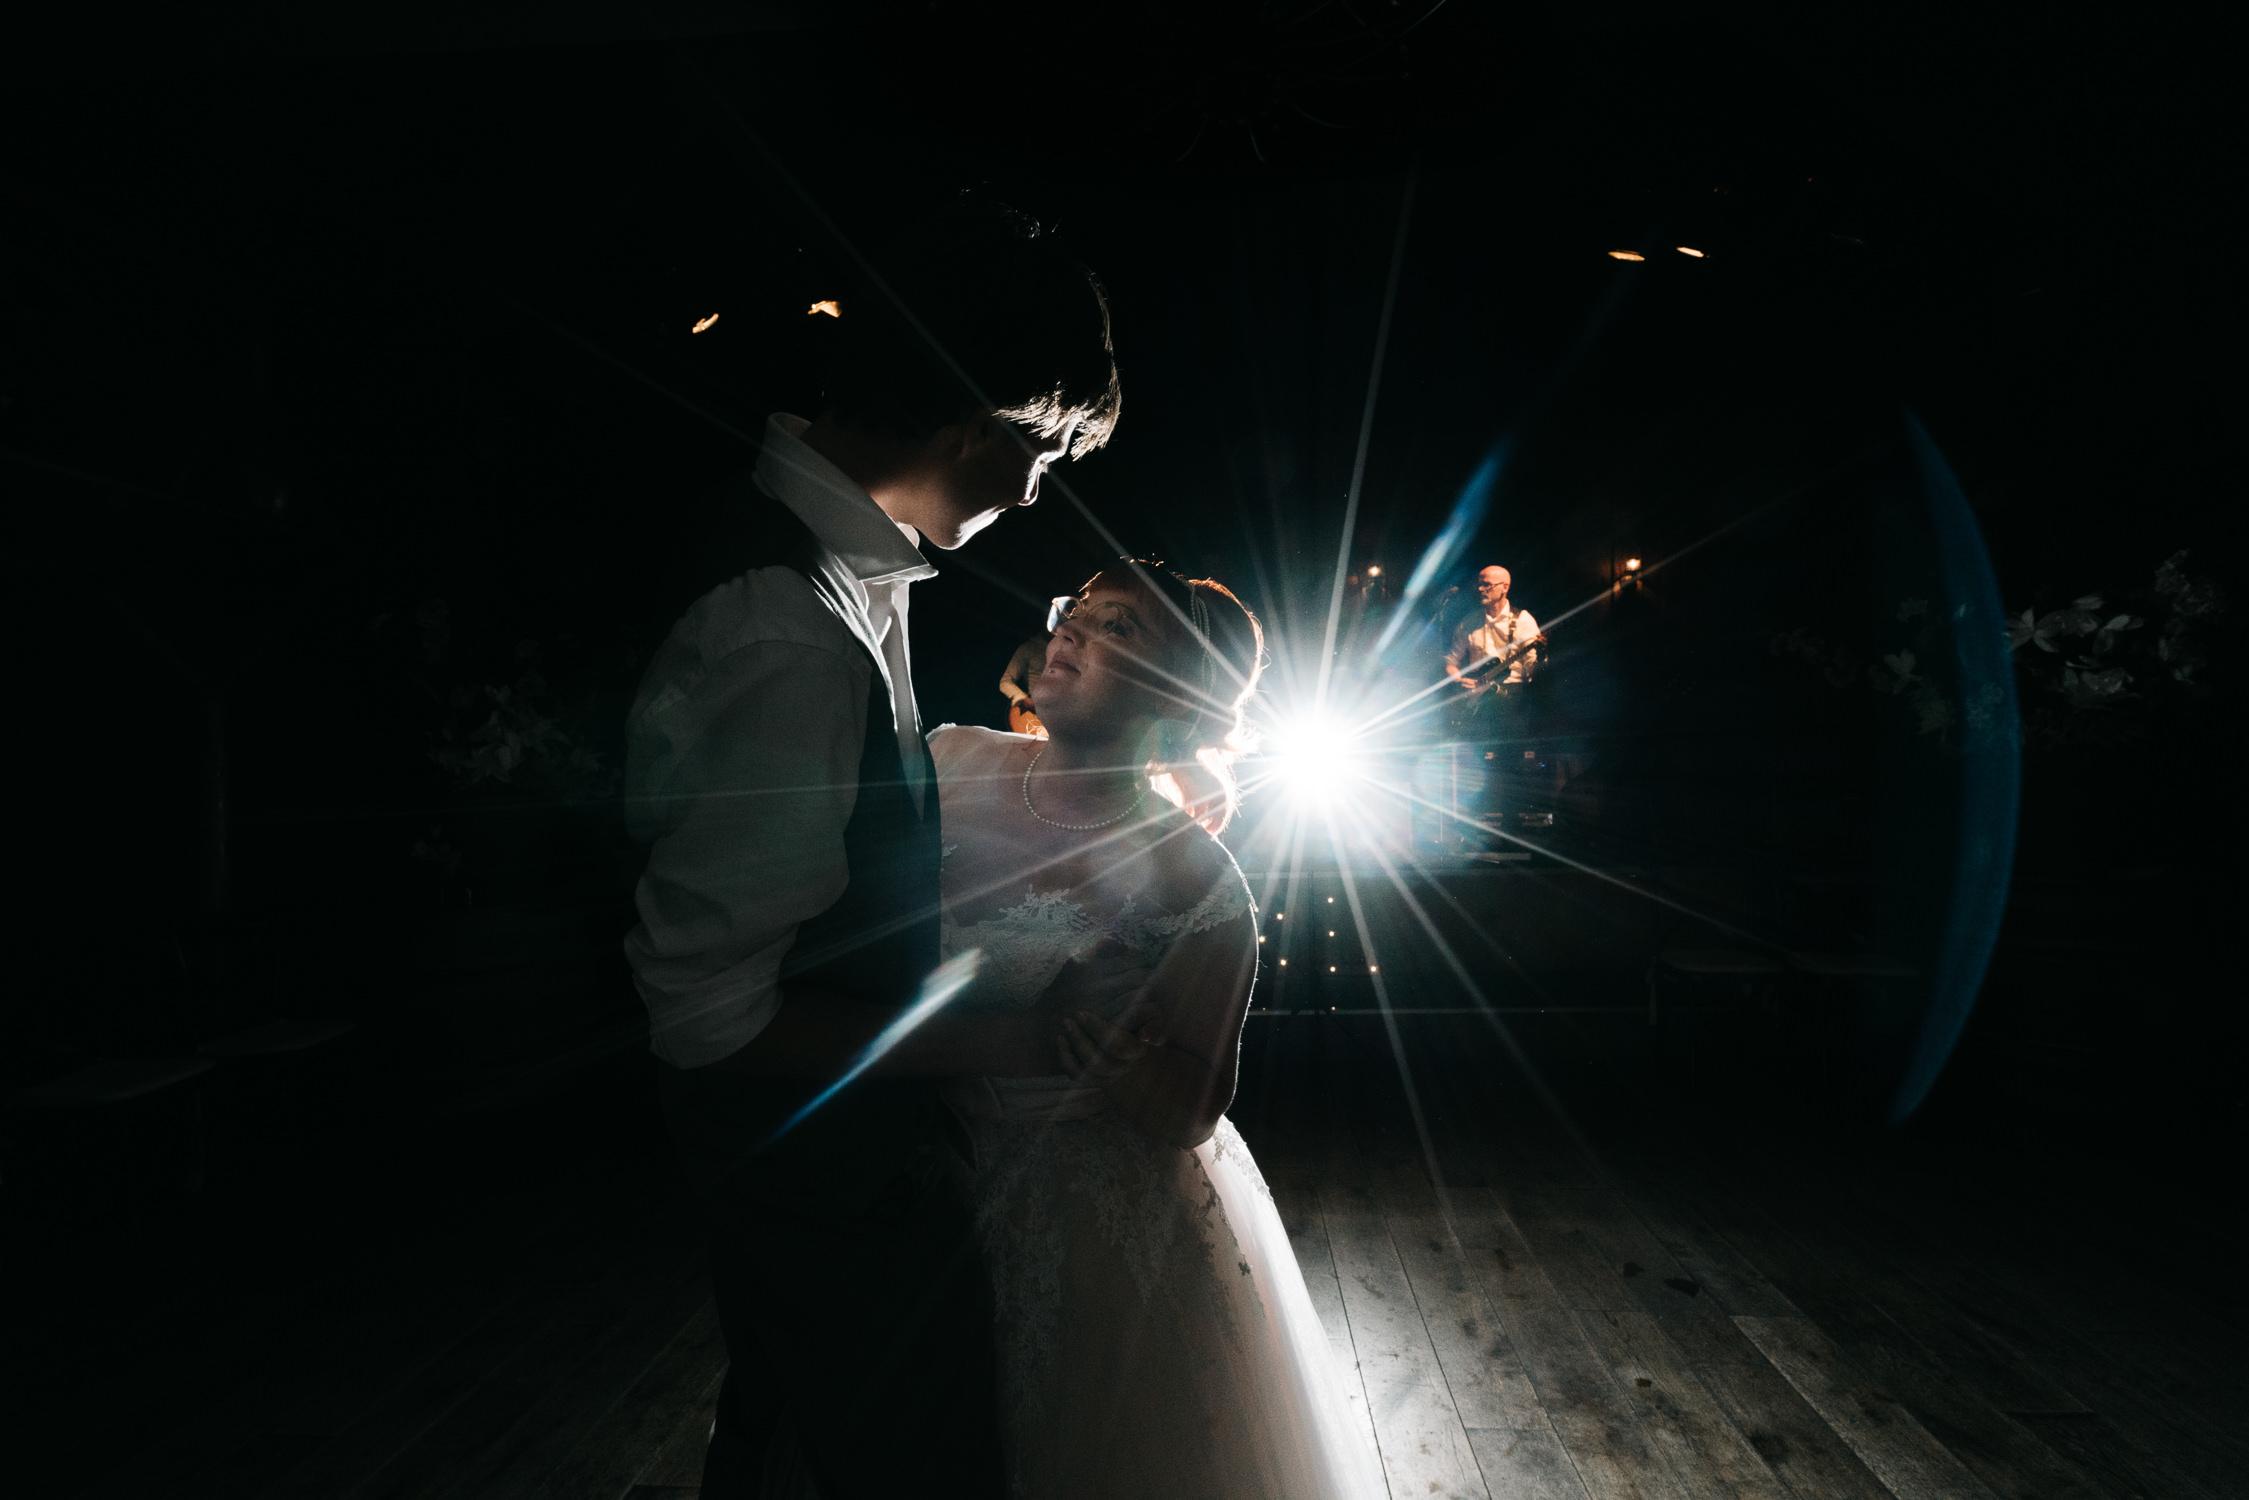 amsterdam-wedding-photographer-bruidsfotografie-trouwfotograaf-mark-hadden-Lucie-Luuk-419.jpg